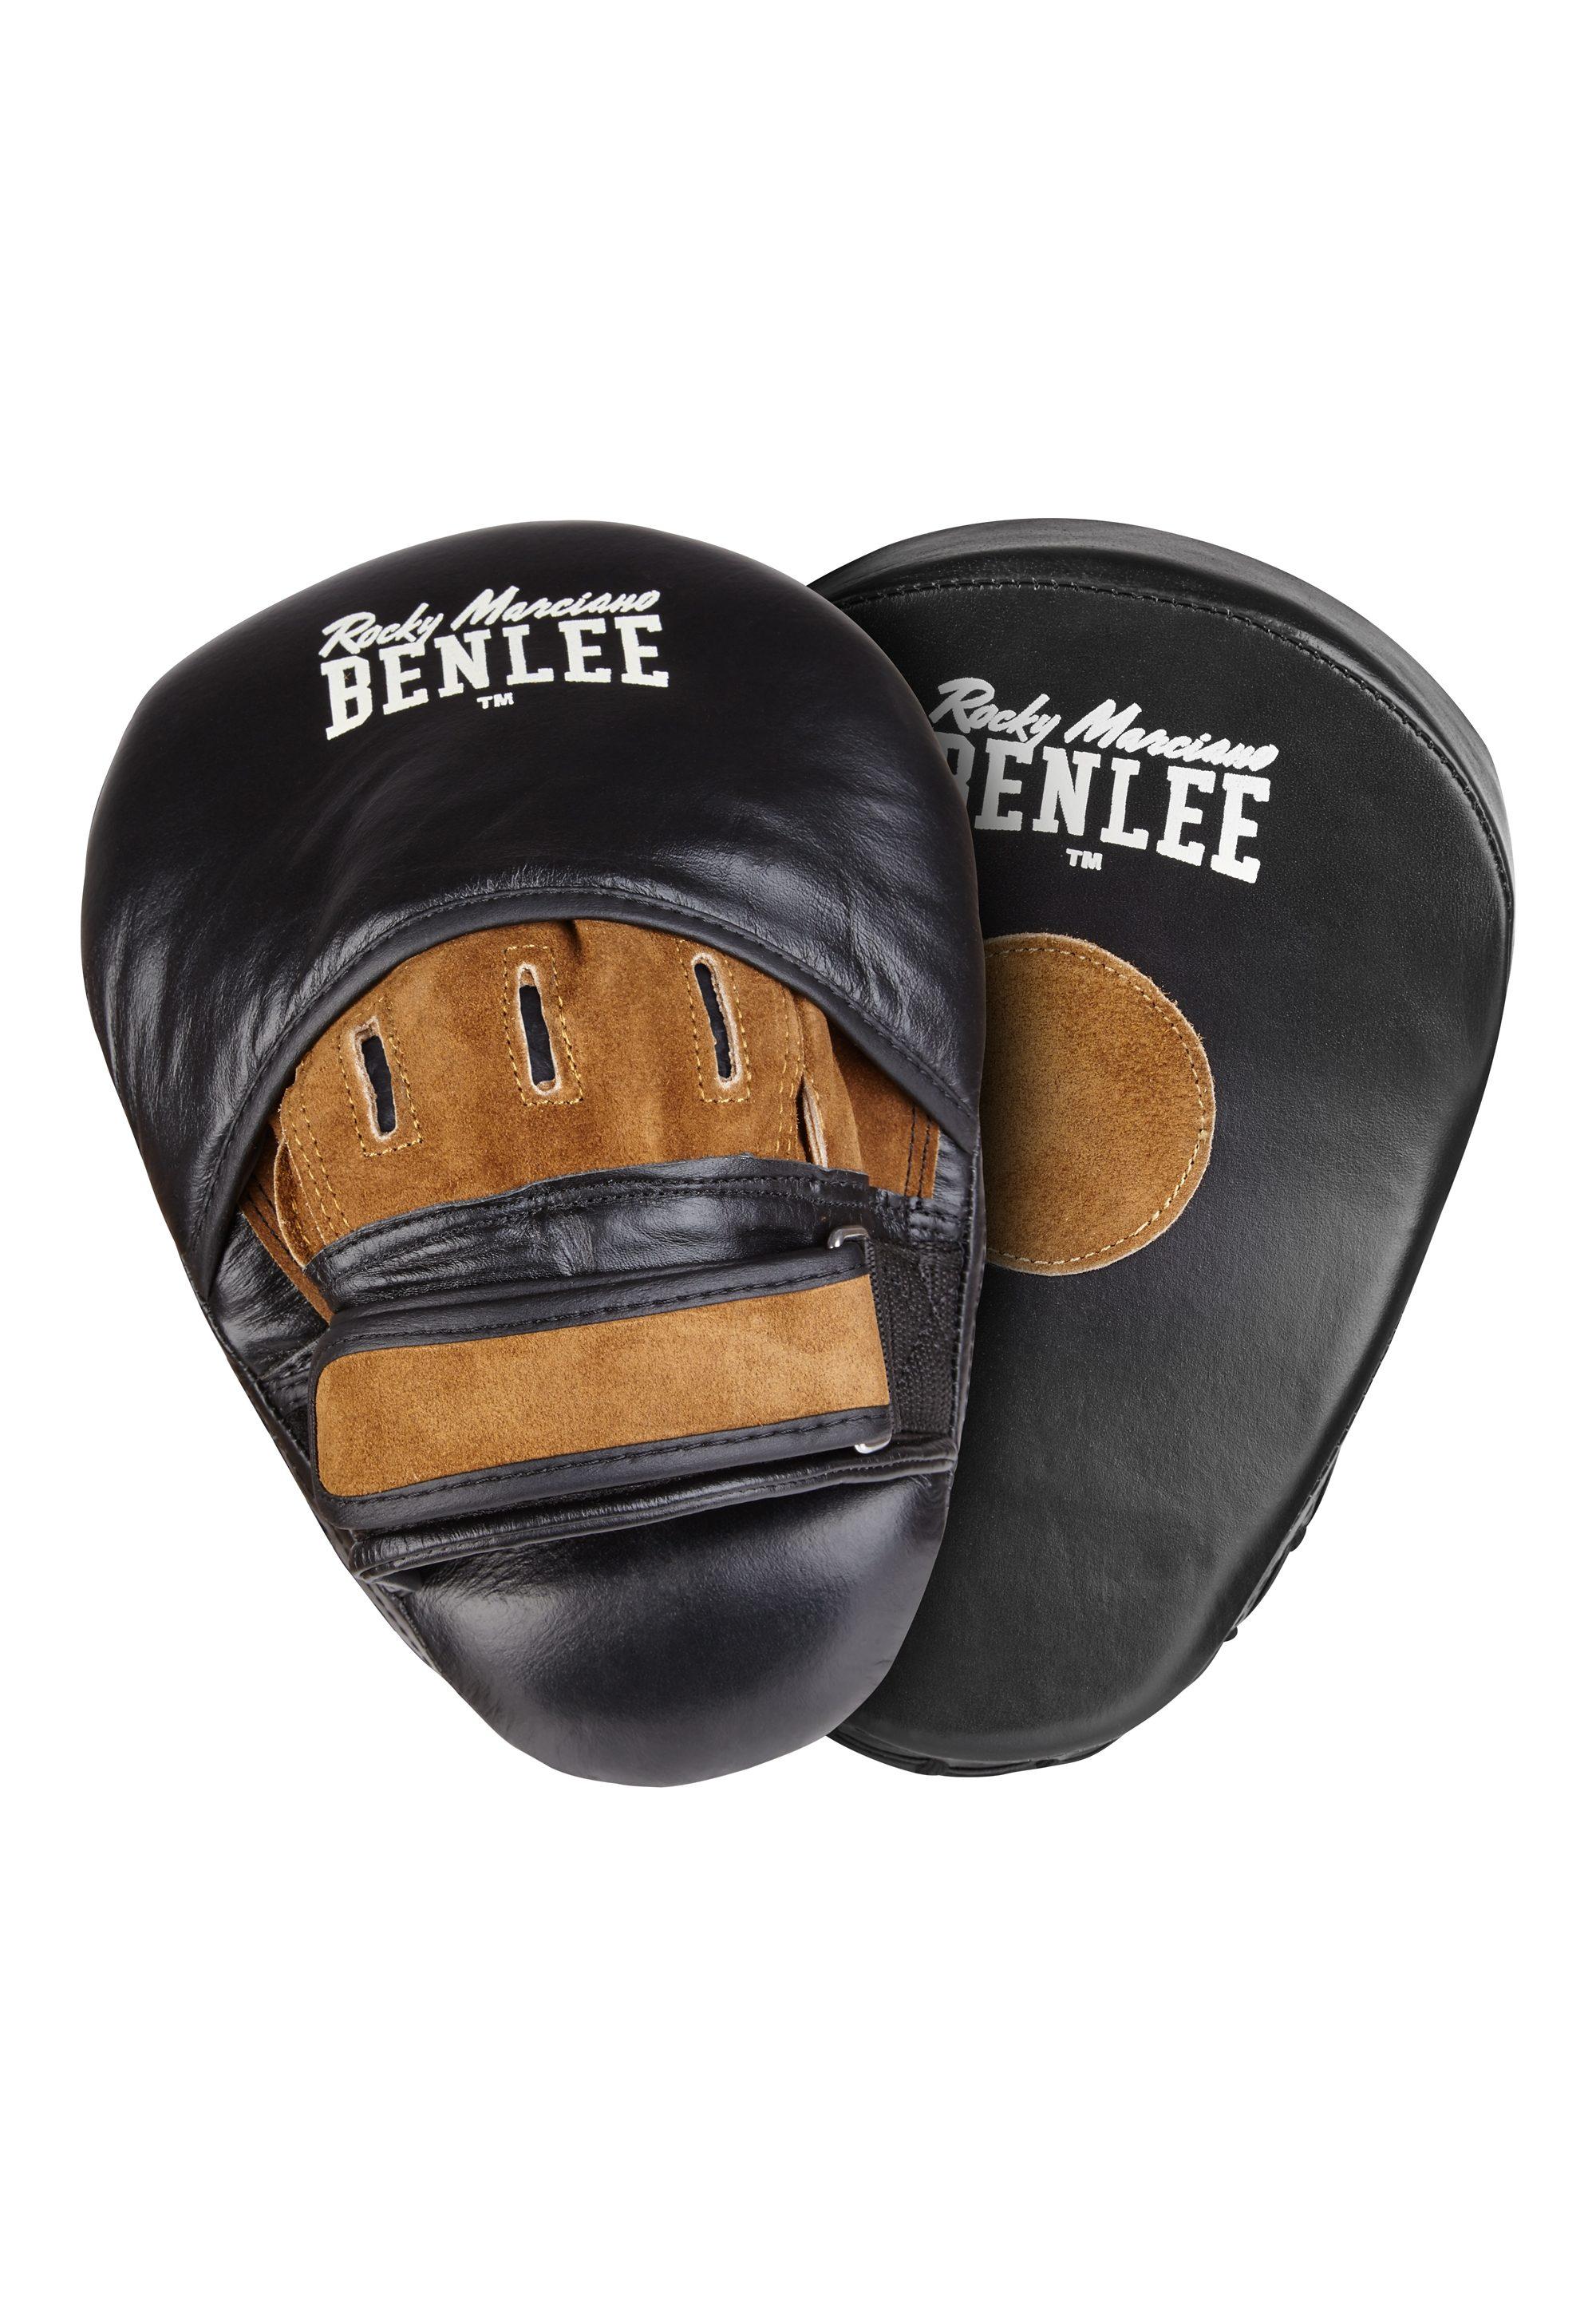 Benlee Rocky Marciano Pads »MOORE«